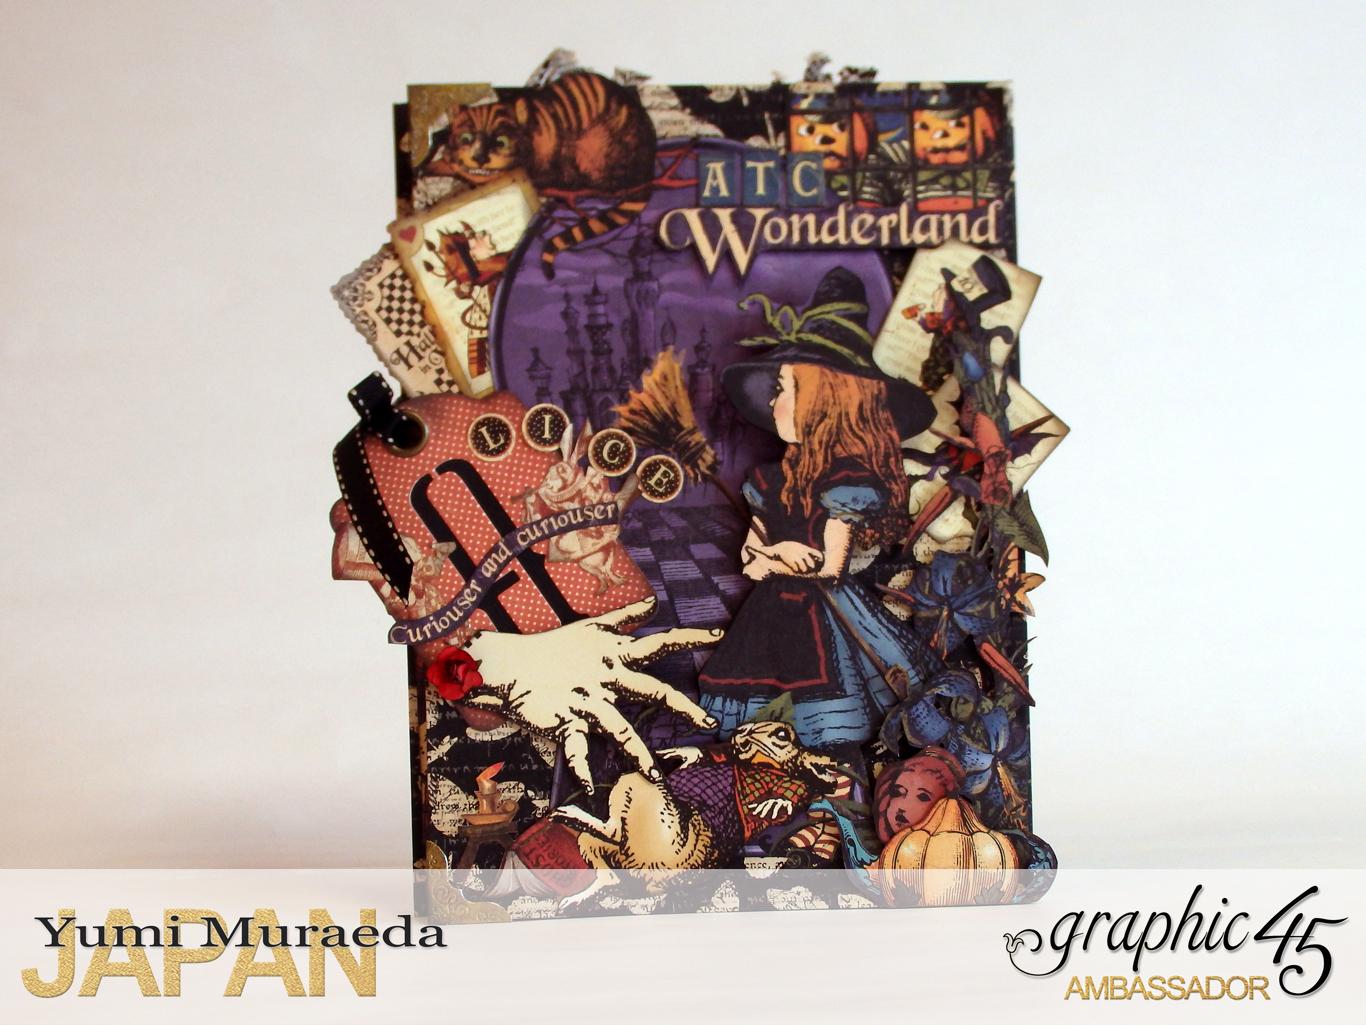 2ATC WonderlandHallowe'en in Wonderland by Yumi MuraeadaProduct by Graphic 45